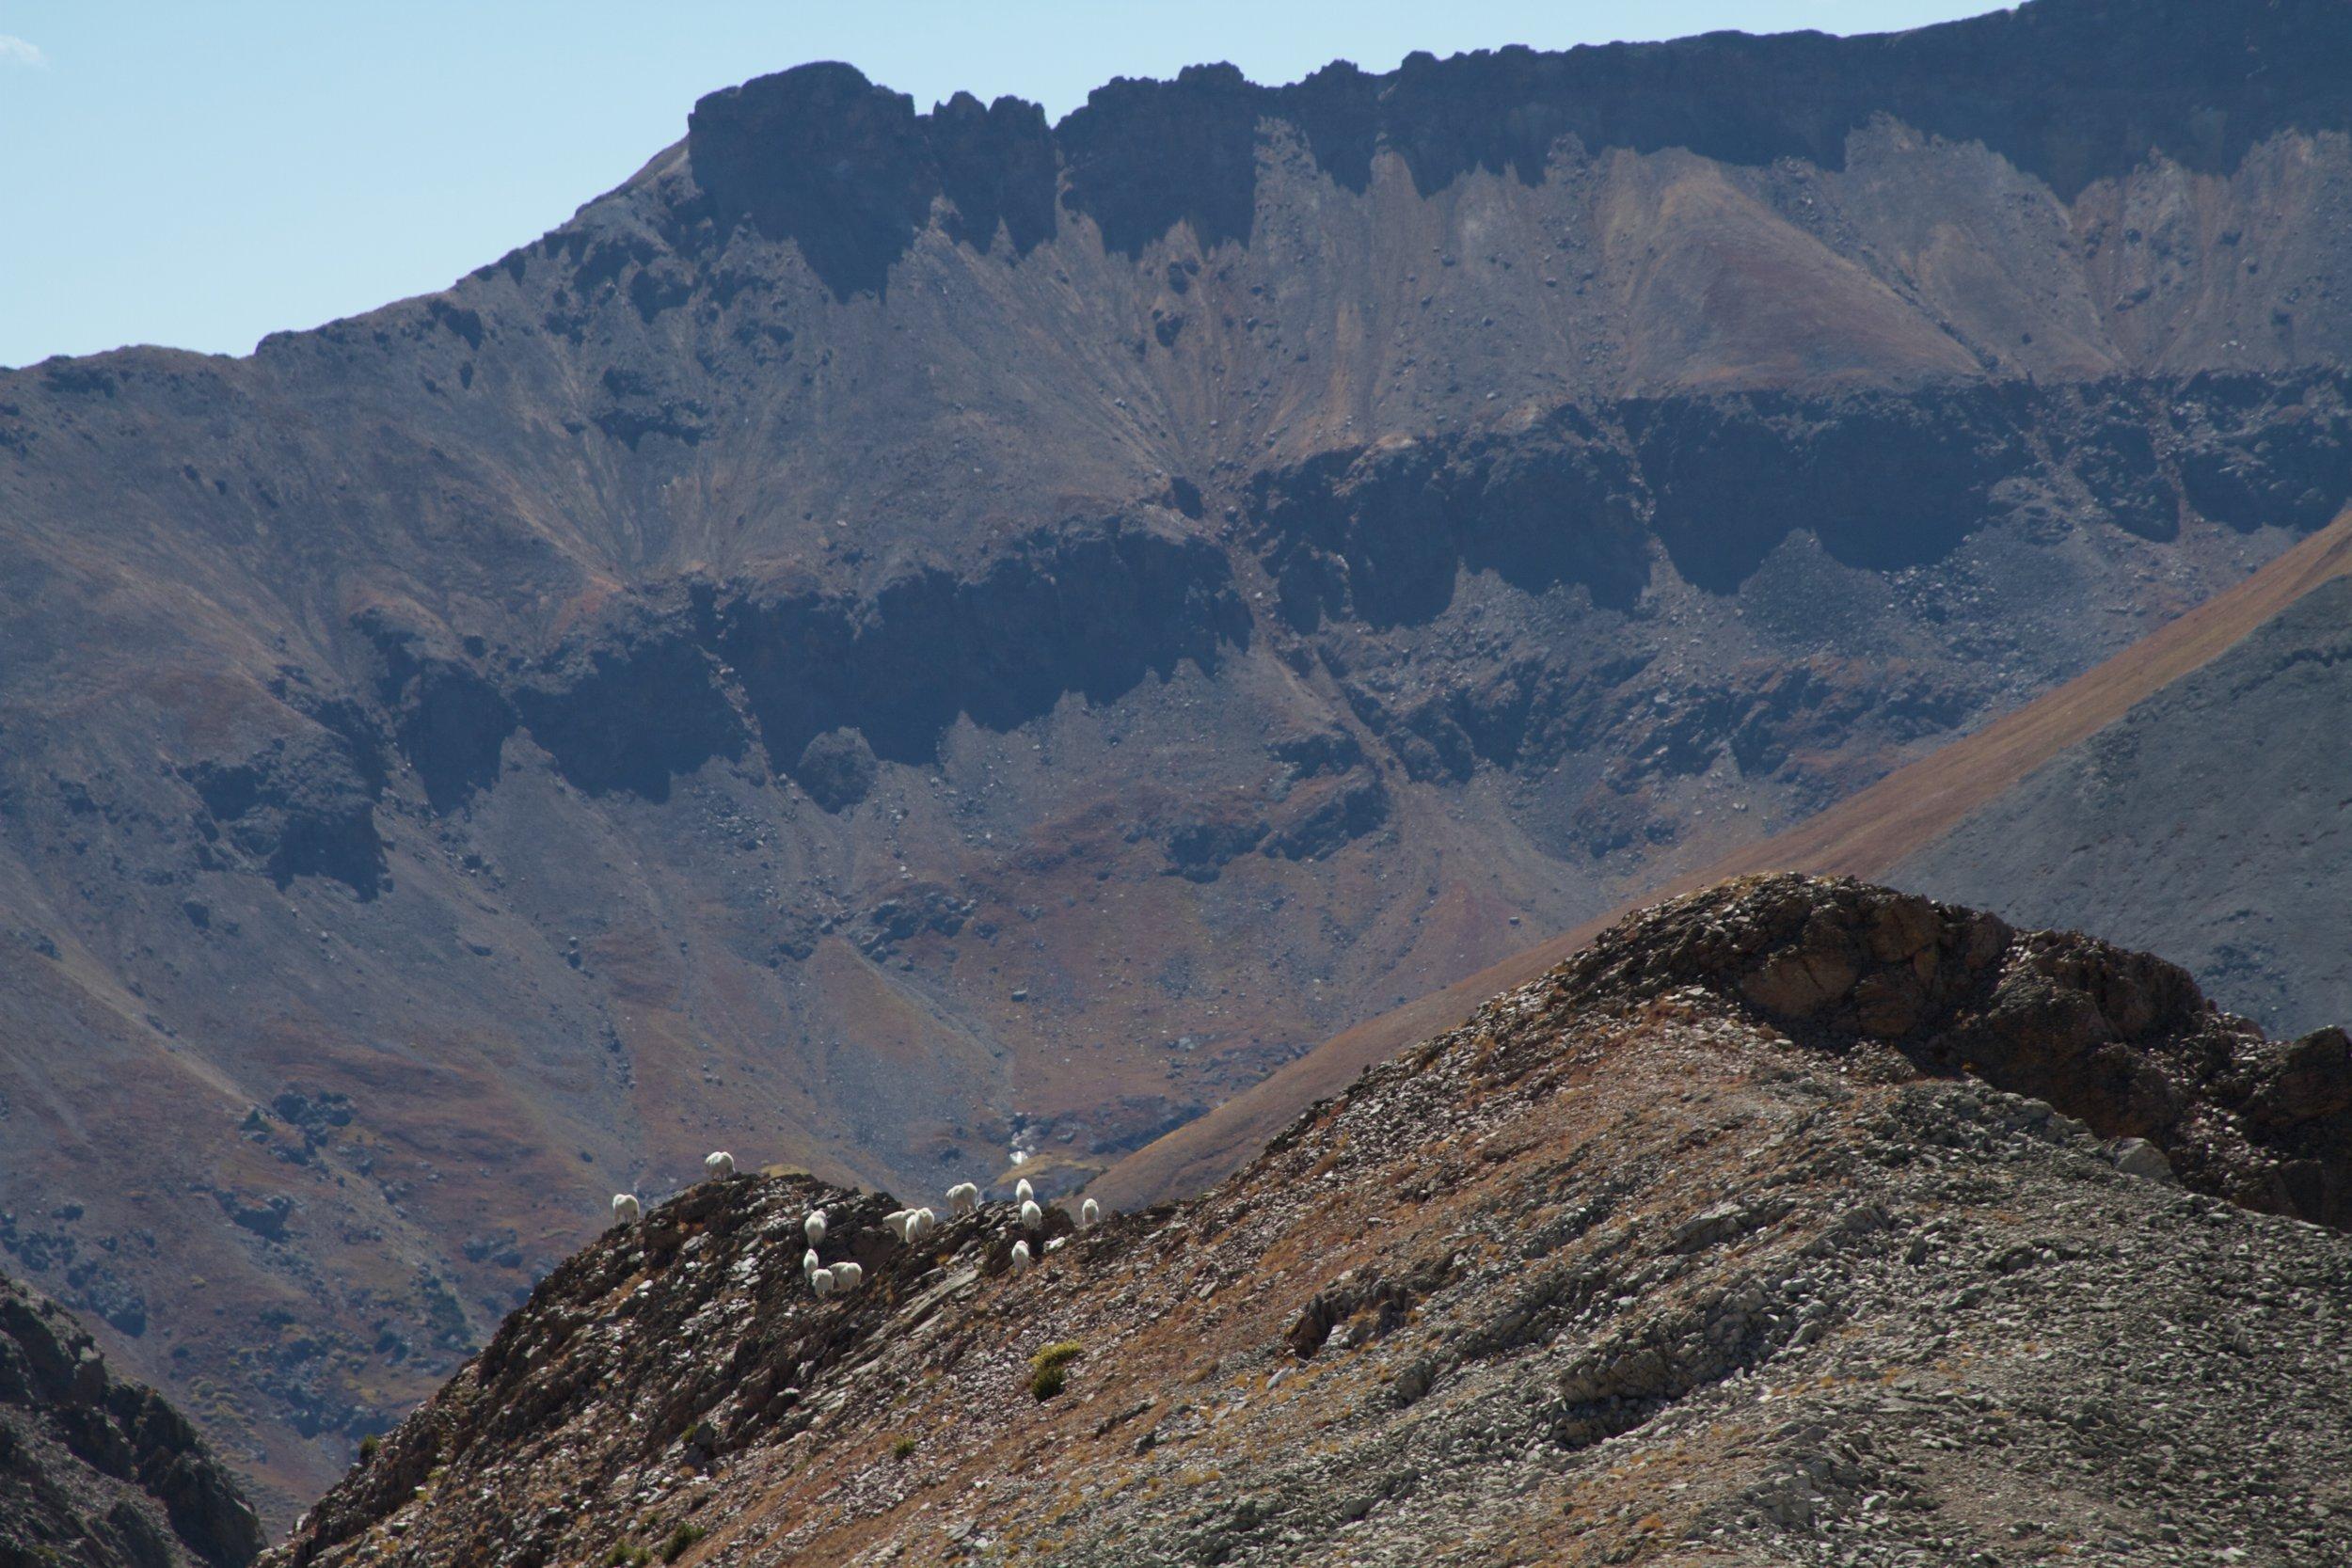 Mountain goats (Boots Ferguson)